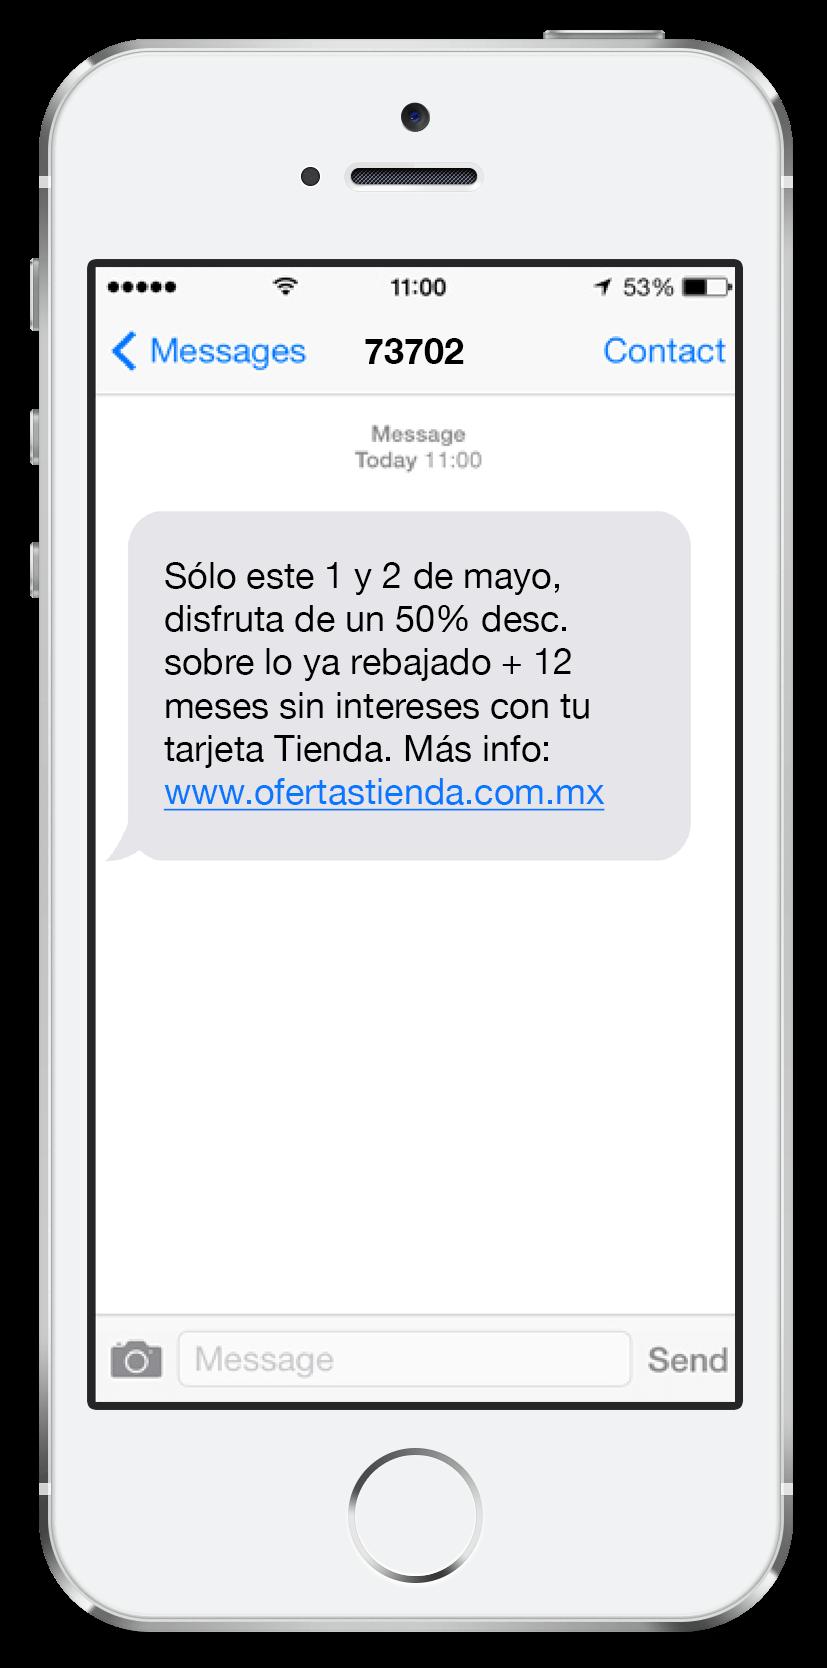 Mensaje SMS Corto 4